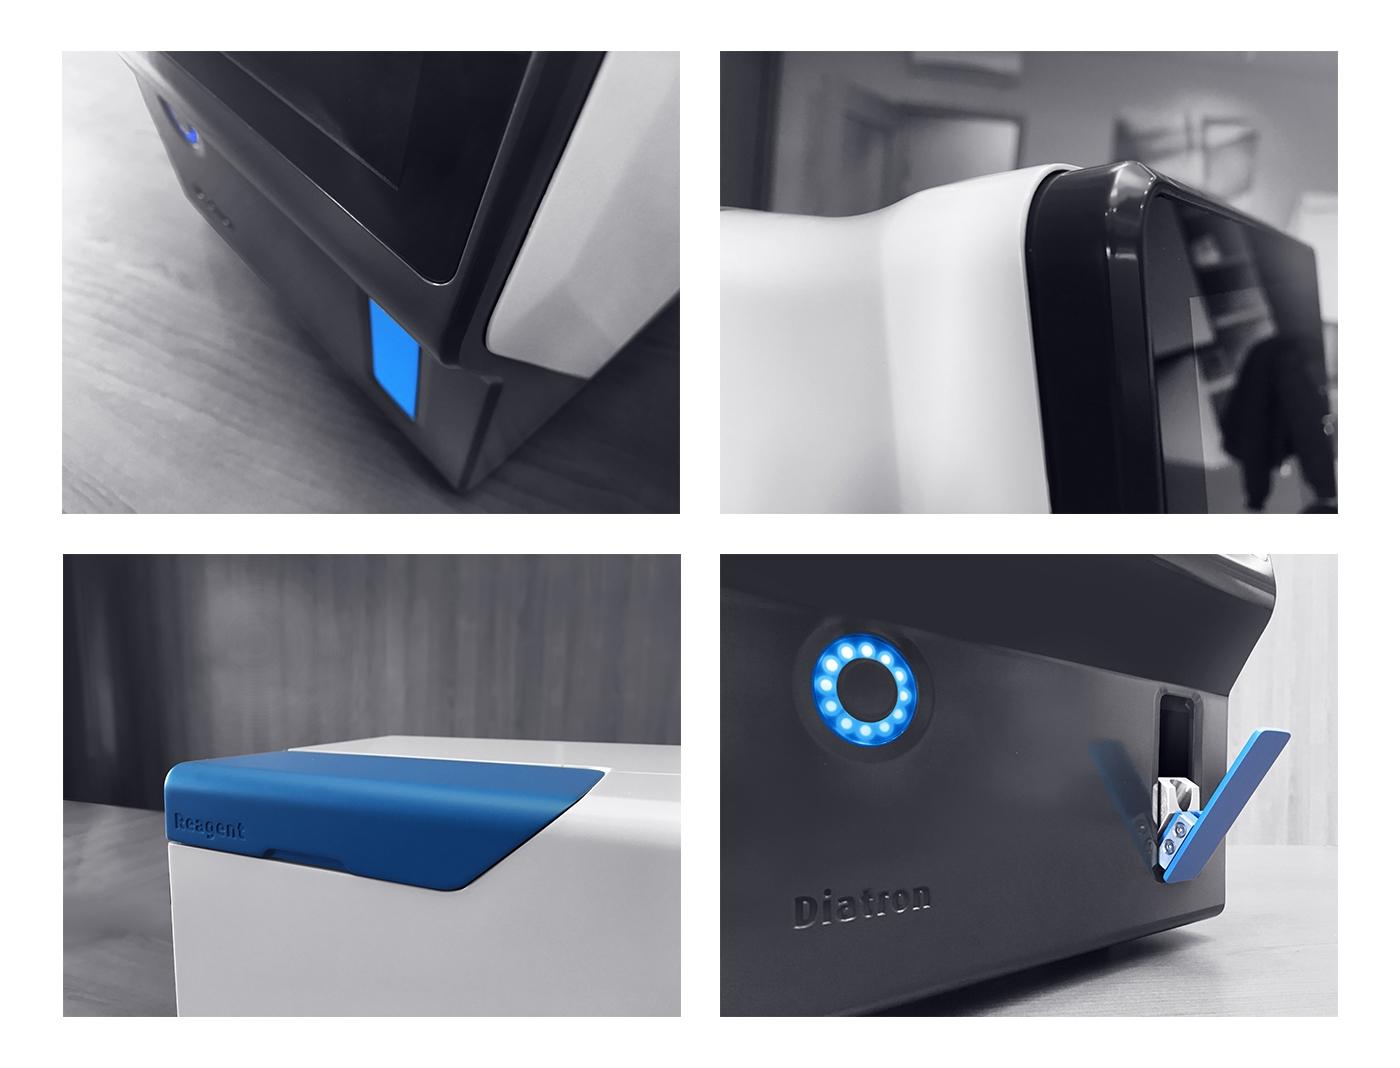 3D printed prototype